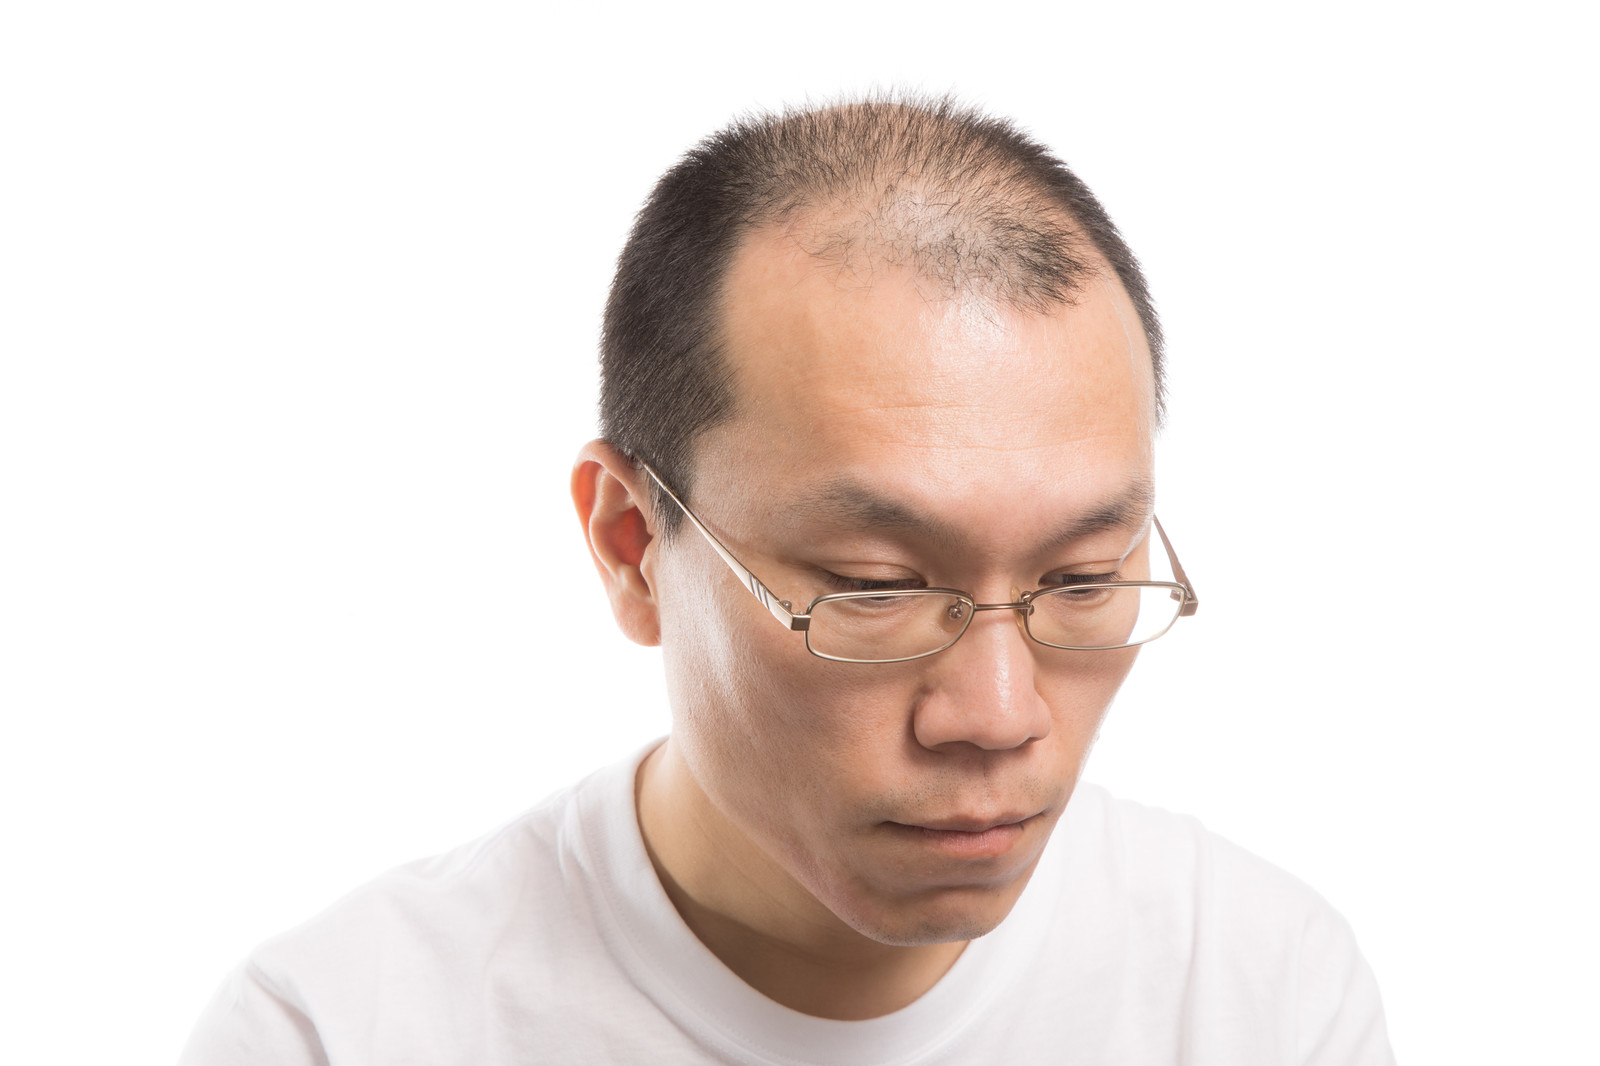 「M字禿げの男性」の写真[モデル:サンライズ鈴木]